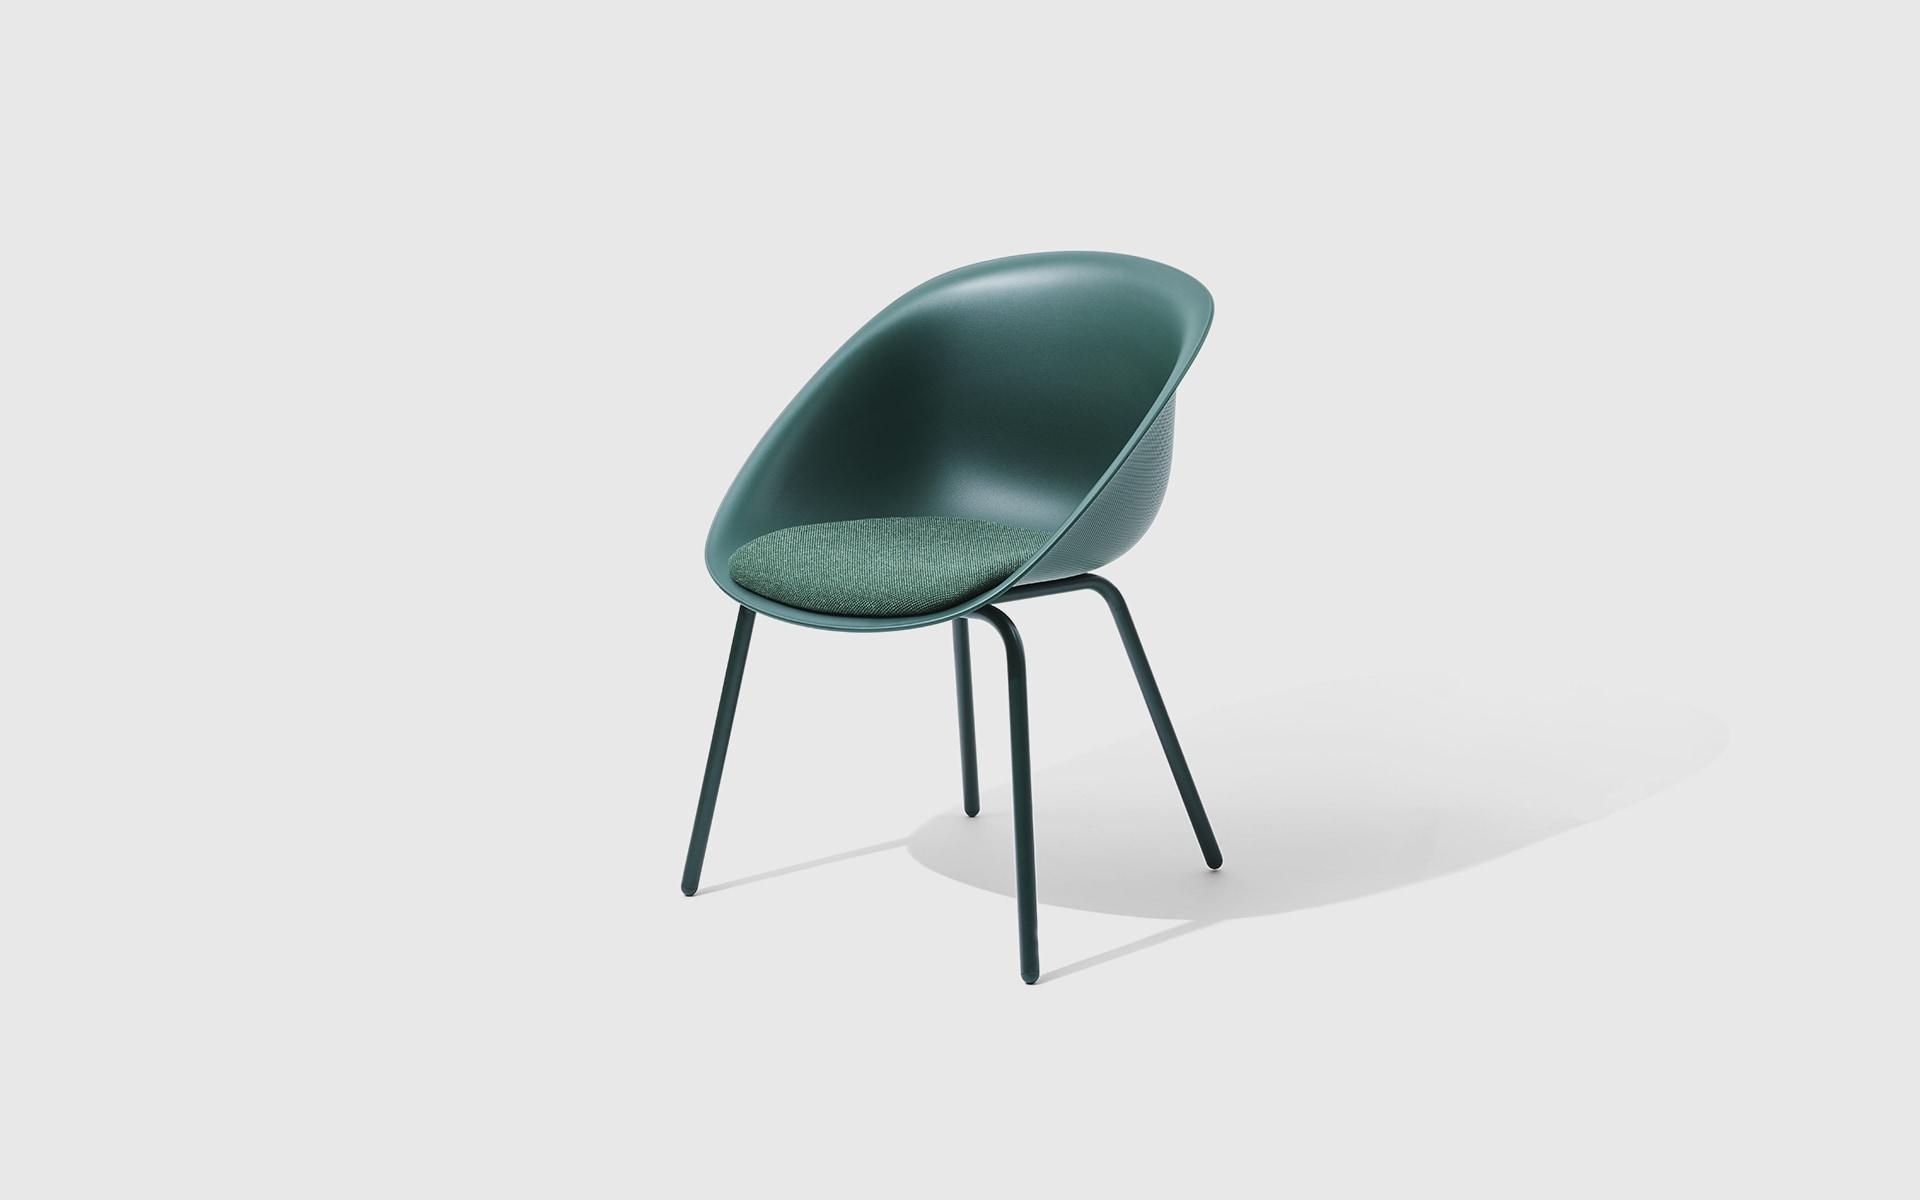 The ITOKI Wan shell chair by ITO Design in dark green